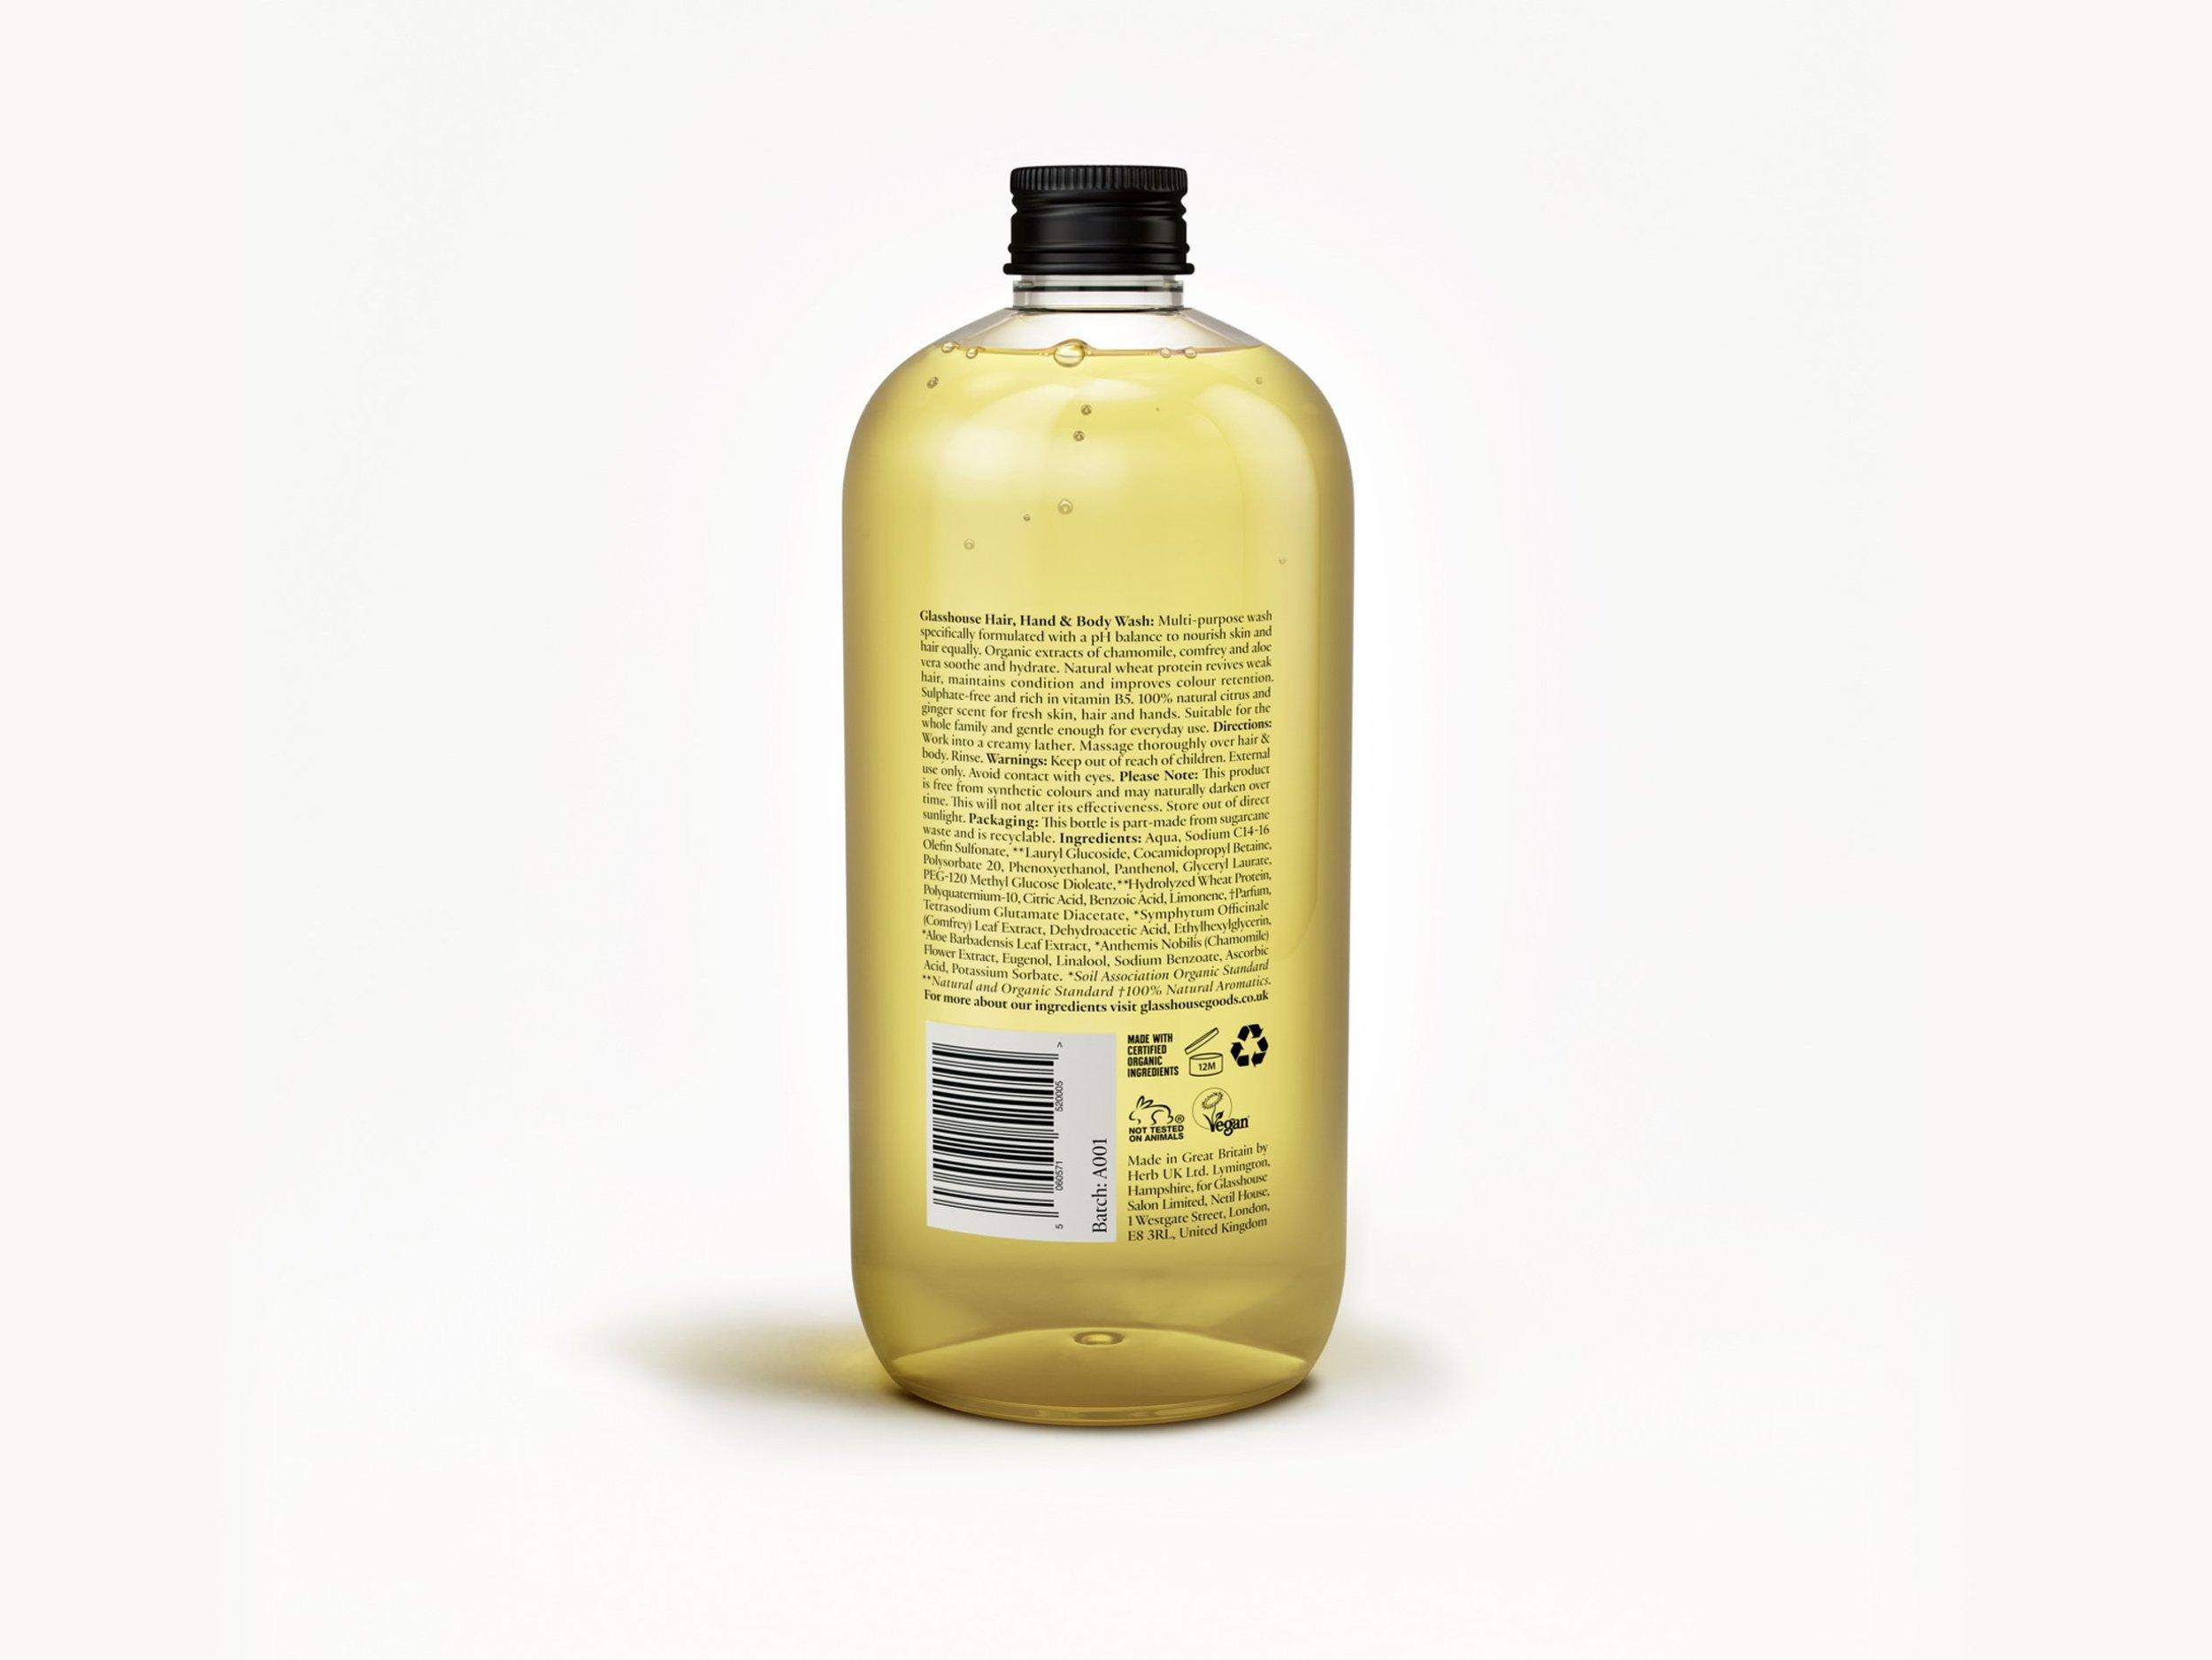 Back_Shop_Bottle_2_a0209d0f-14b3-4e97-be2c-51c4d71b1fd5_2800x.jpg